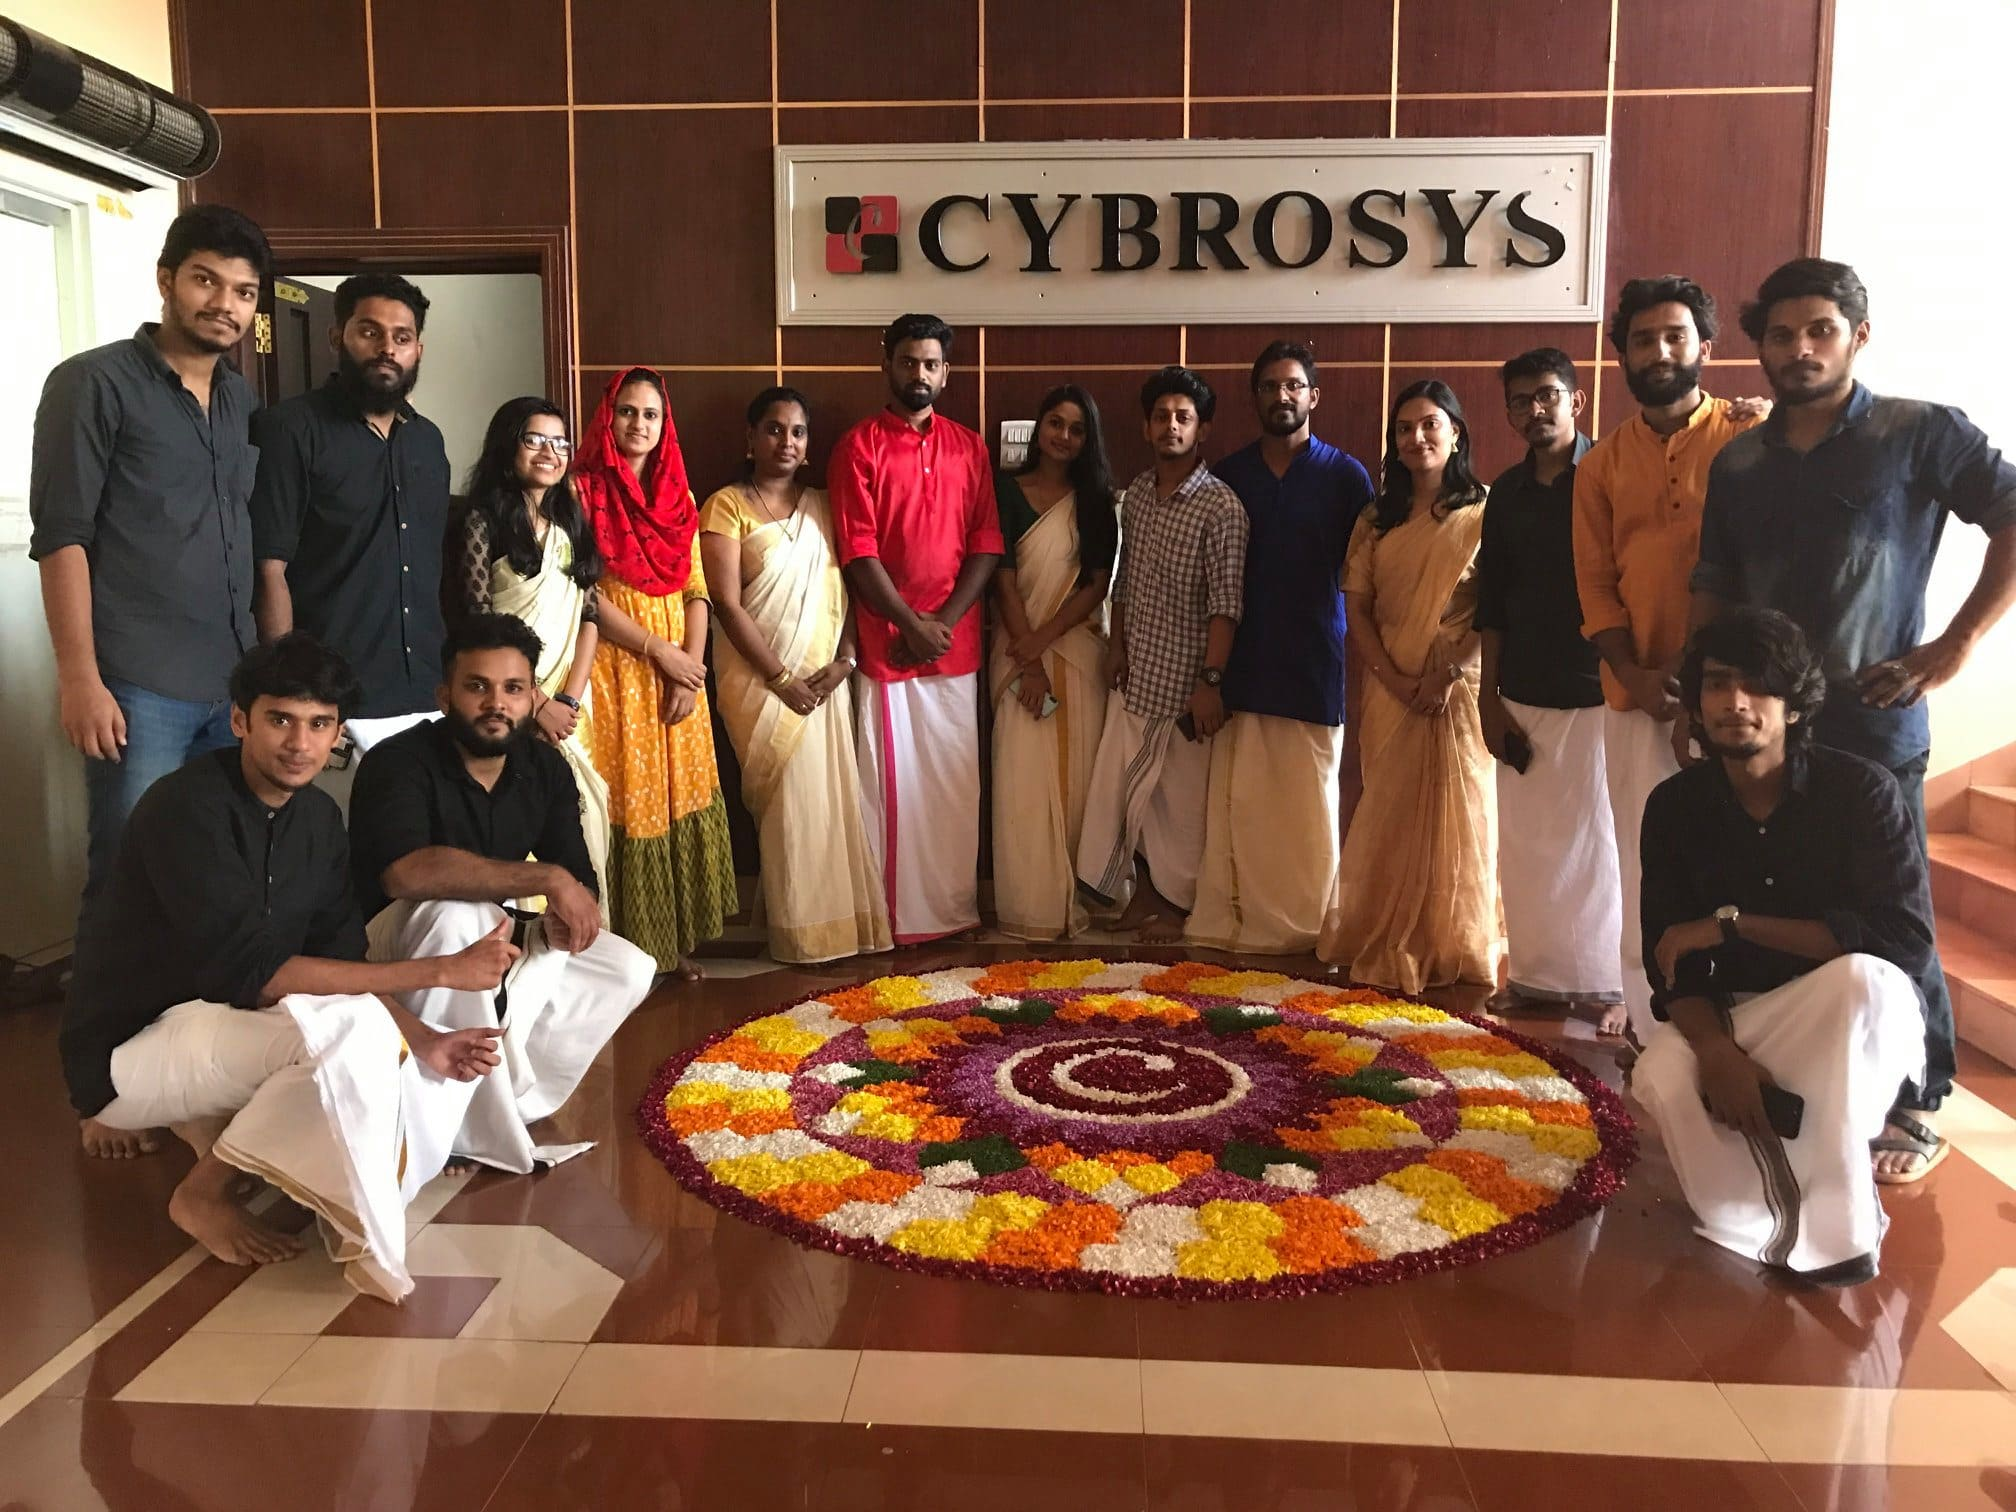 Cybrosys